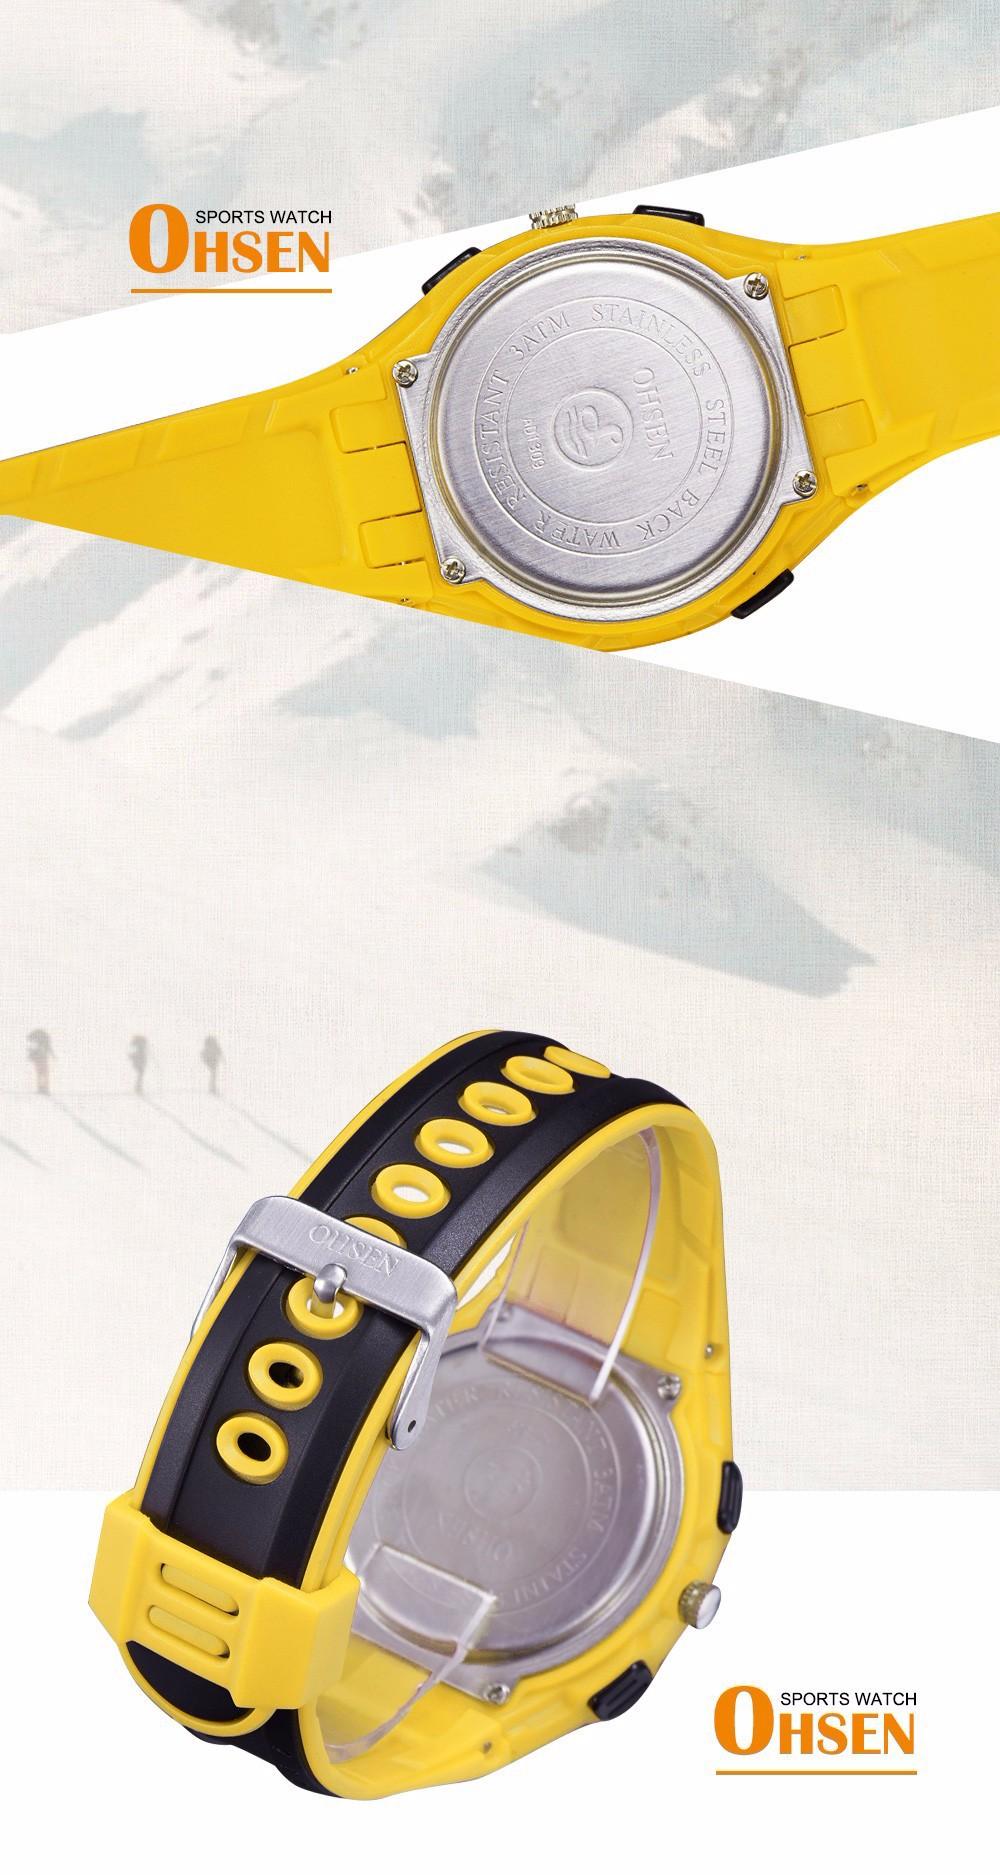 Original Ohsen Brand Fashion Sports Men's Watches 30M Waterproof Rubber Black Rubber Band Digital Sport Wristwatch for Men Gift (21)